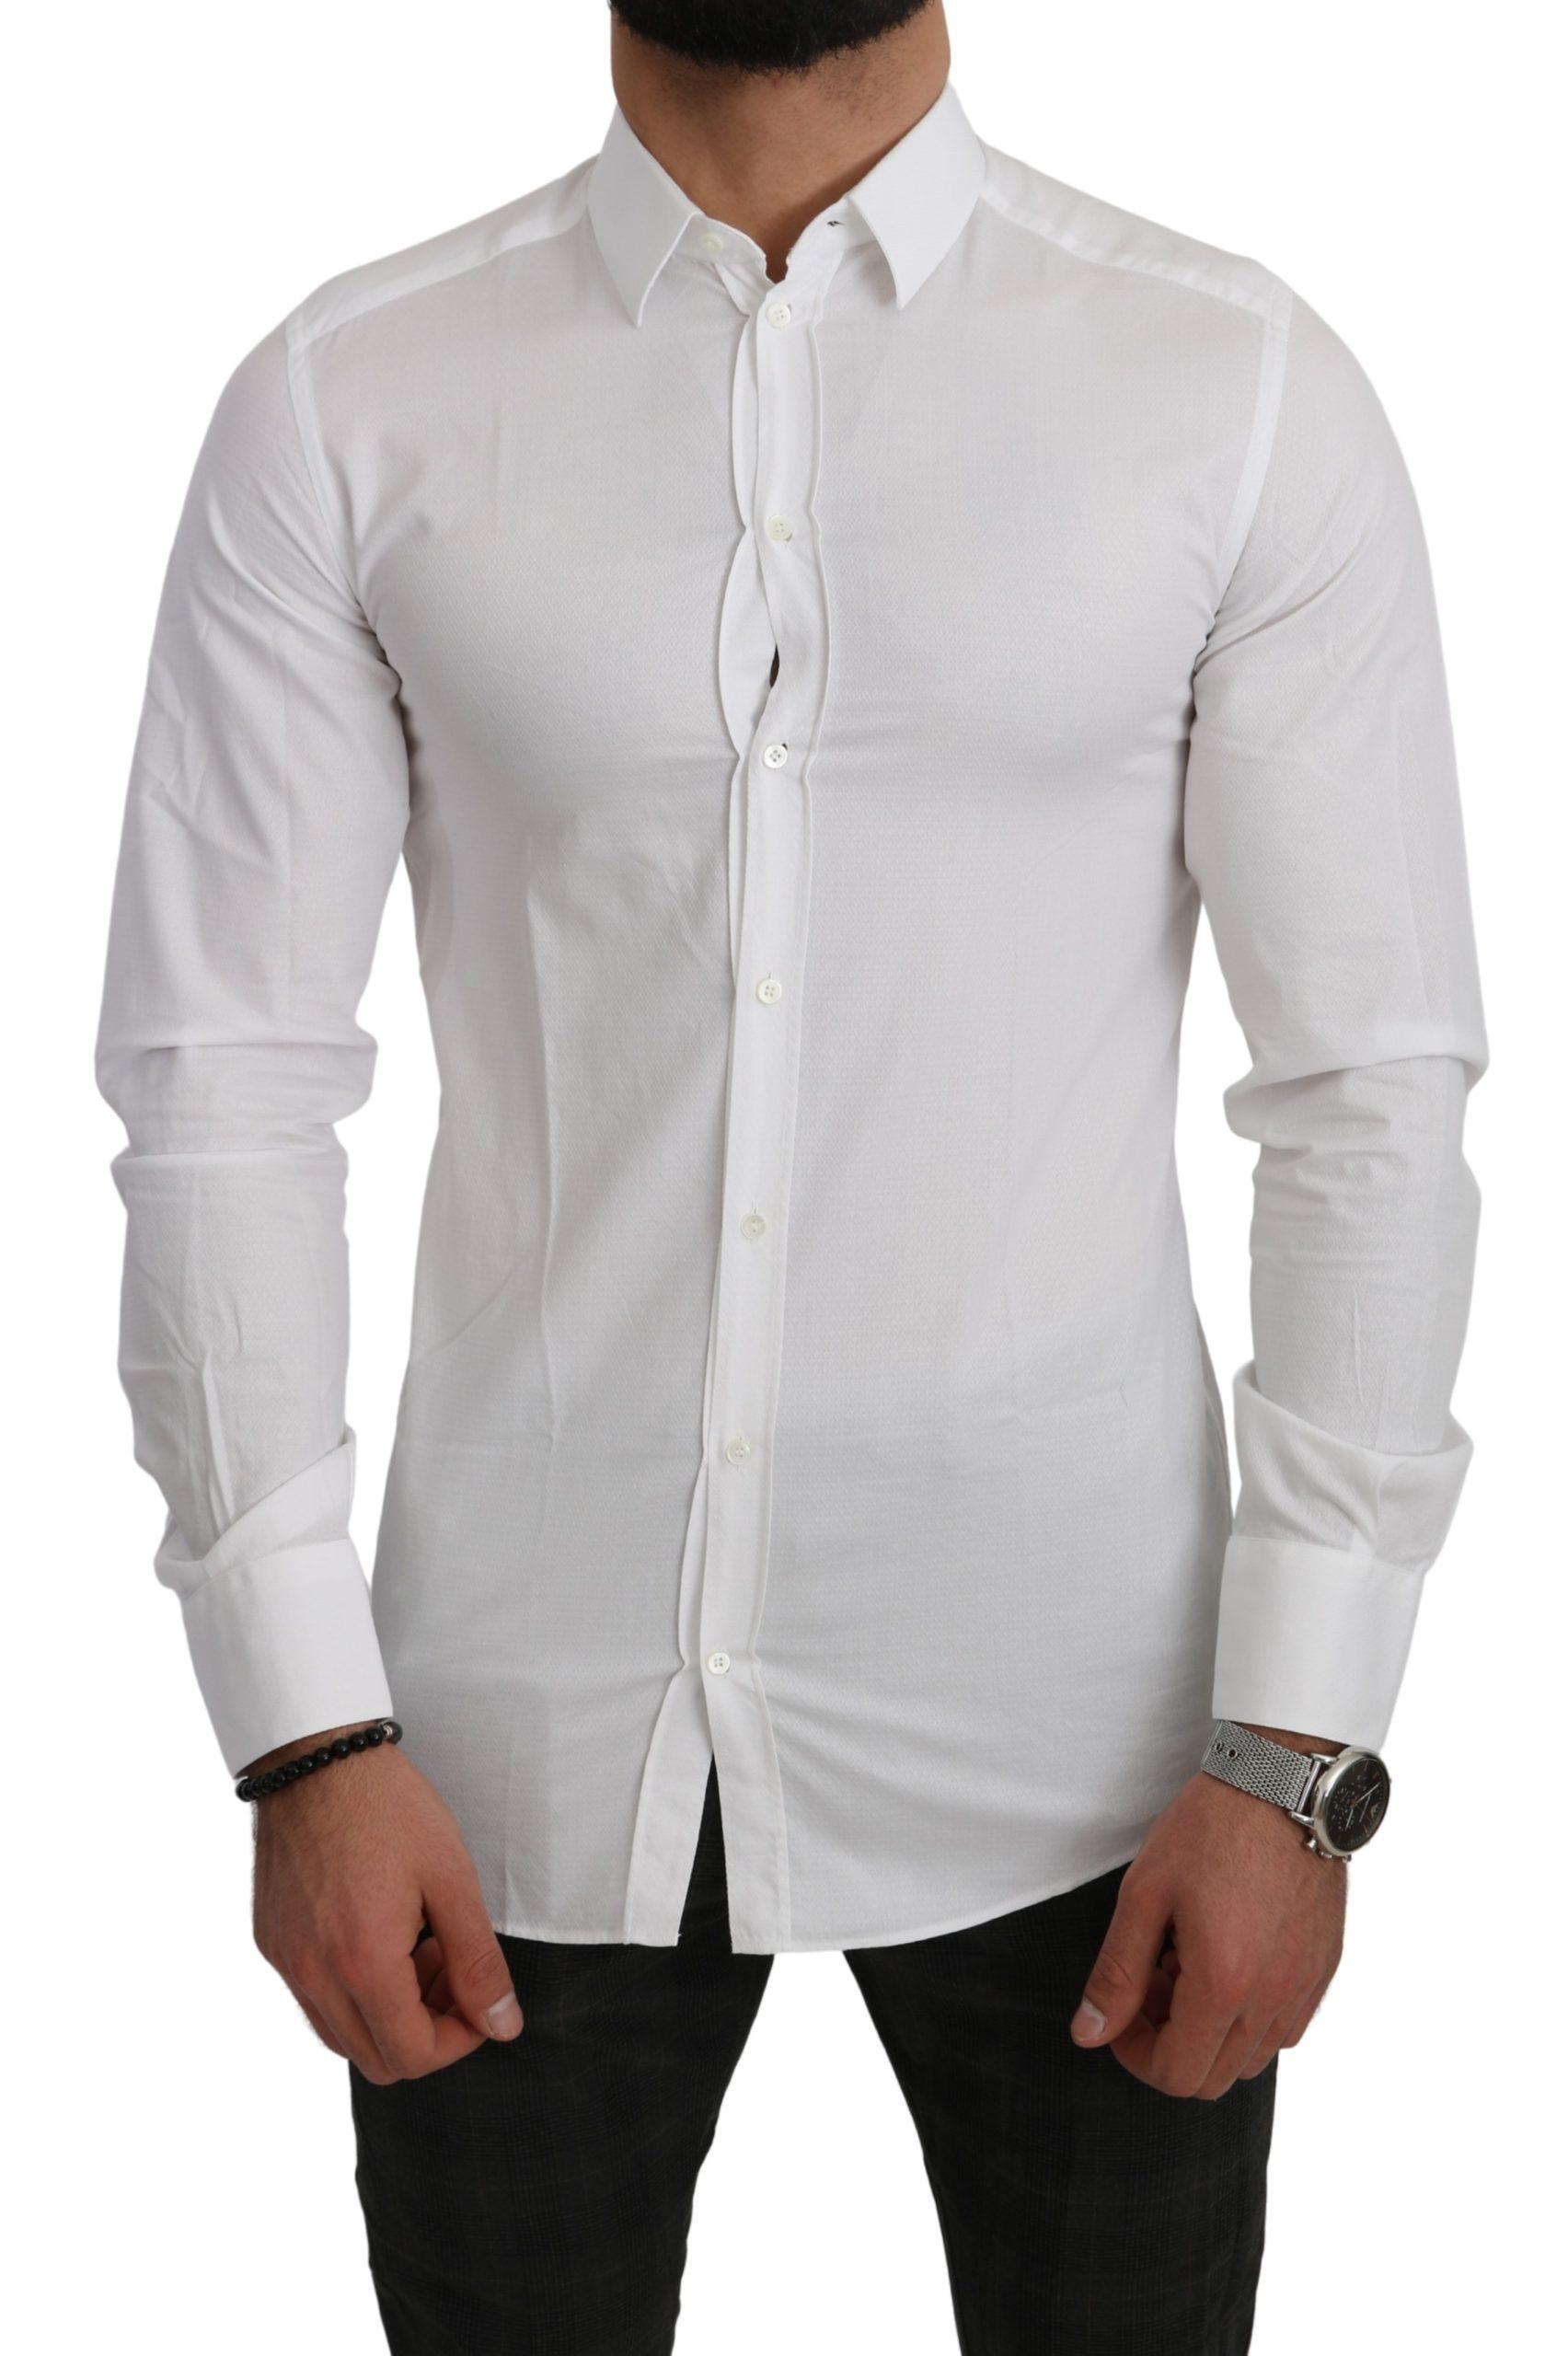 Dolce & Gabbana Men's Cotton Solid Dress Formal Shirt White TSH5029 - IT39 | S